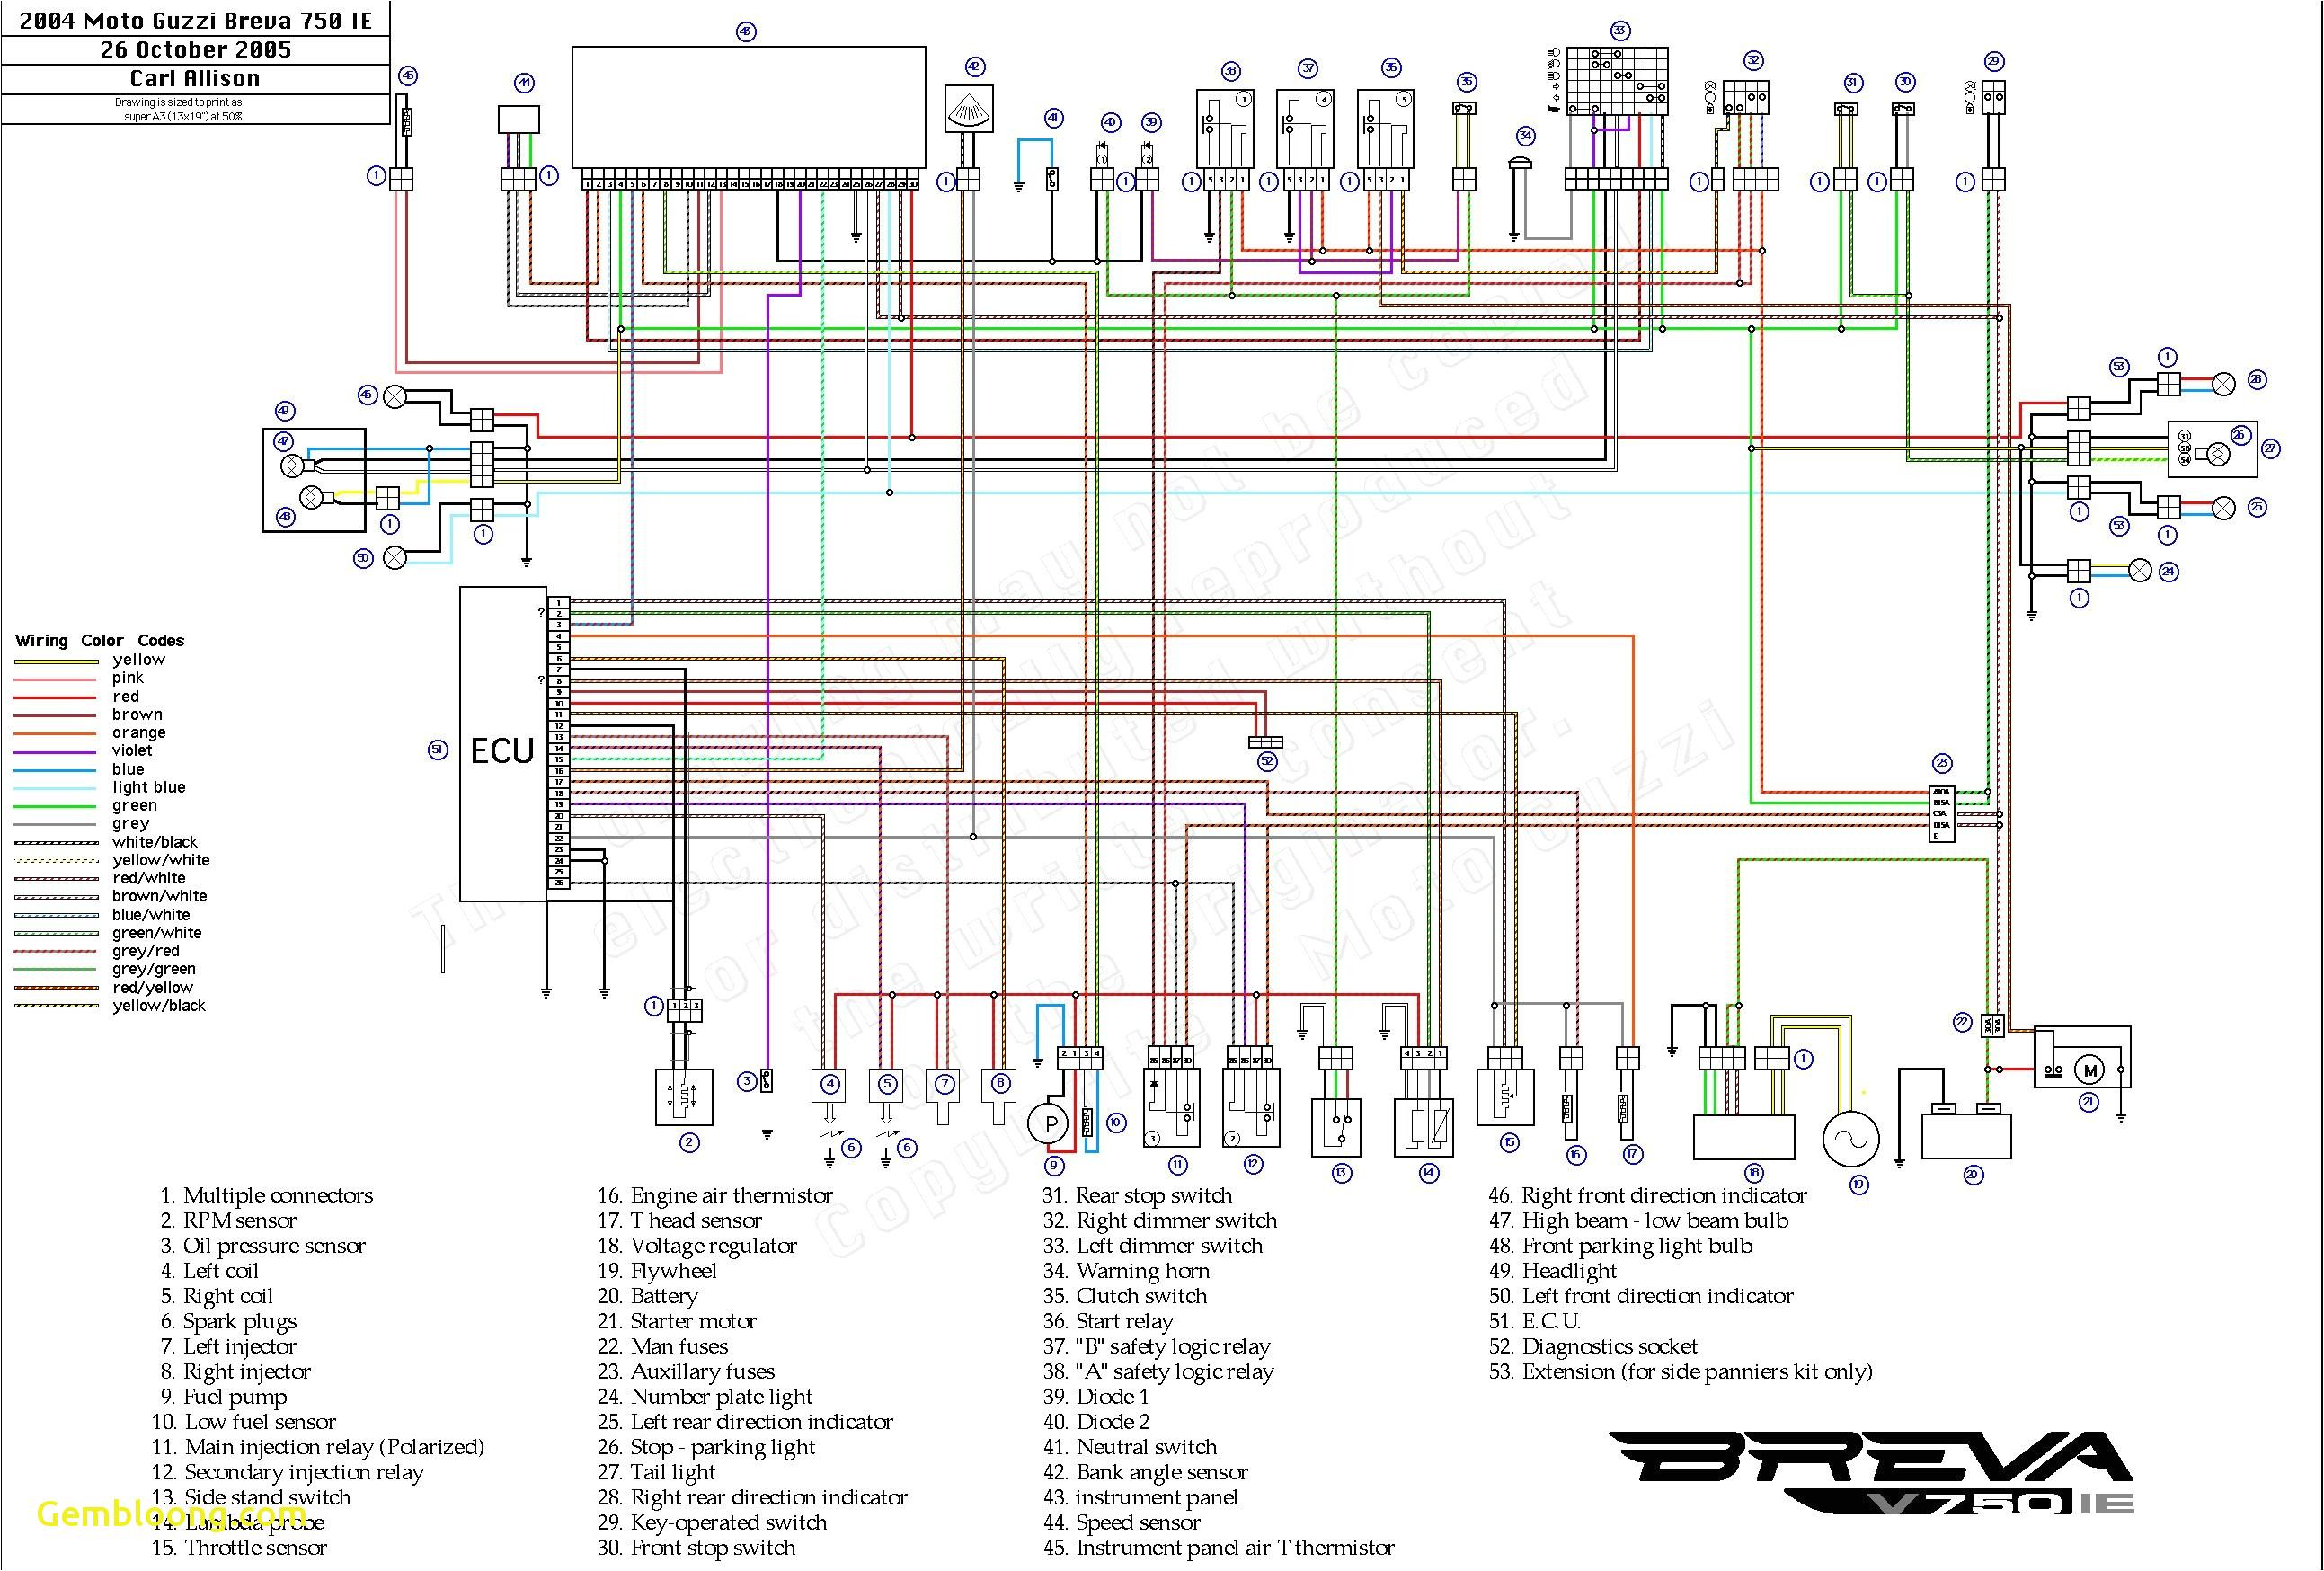 index 47 power supply circuit circuit diagram seekiccom databaseindex 12 sensor circuit circuit diagram seekiccom wiring